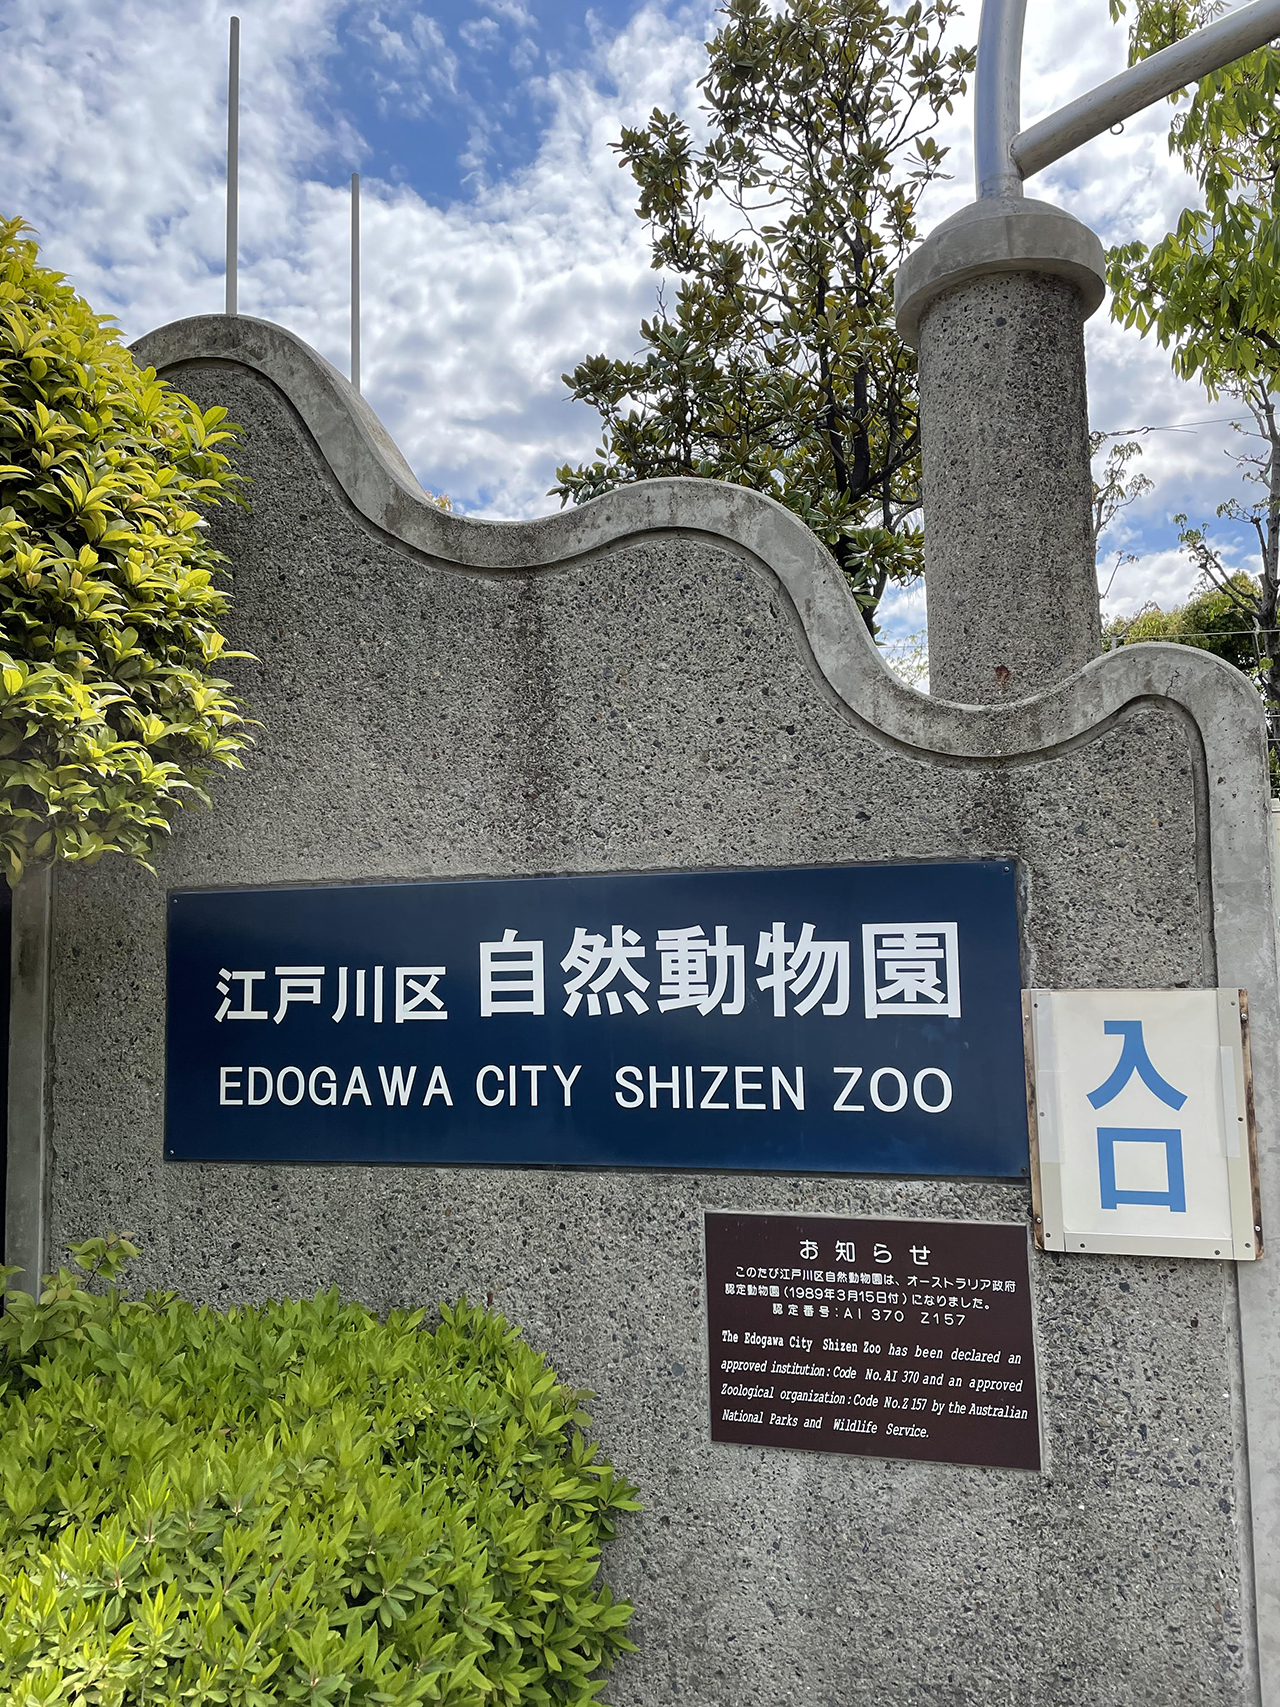 江戸川区自然動物園の外観